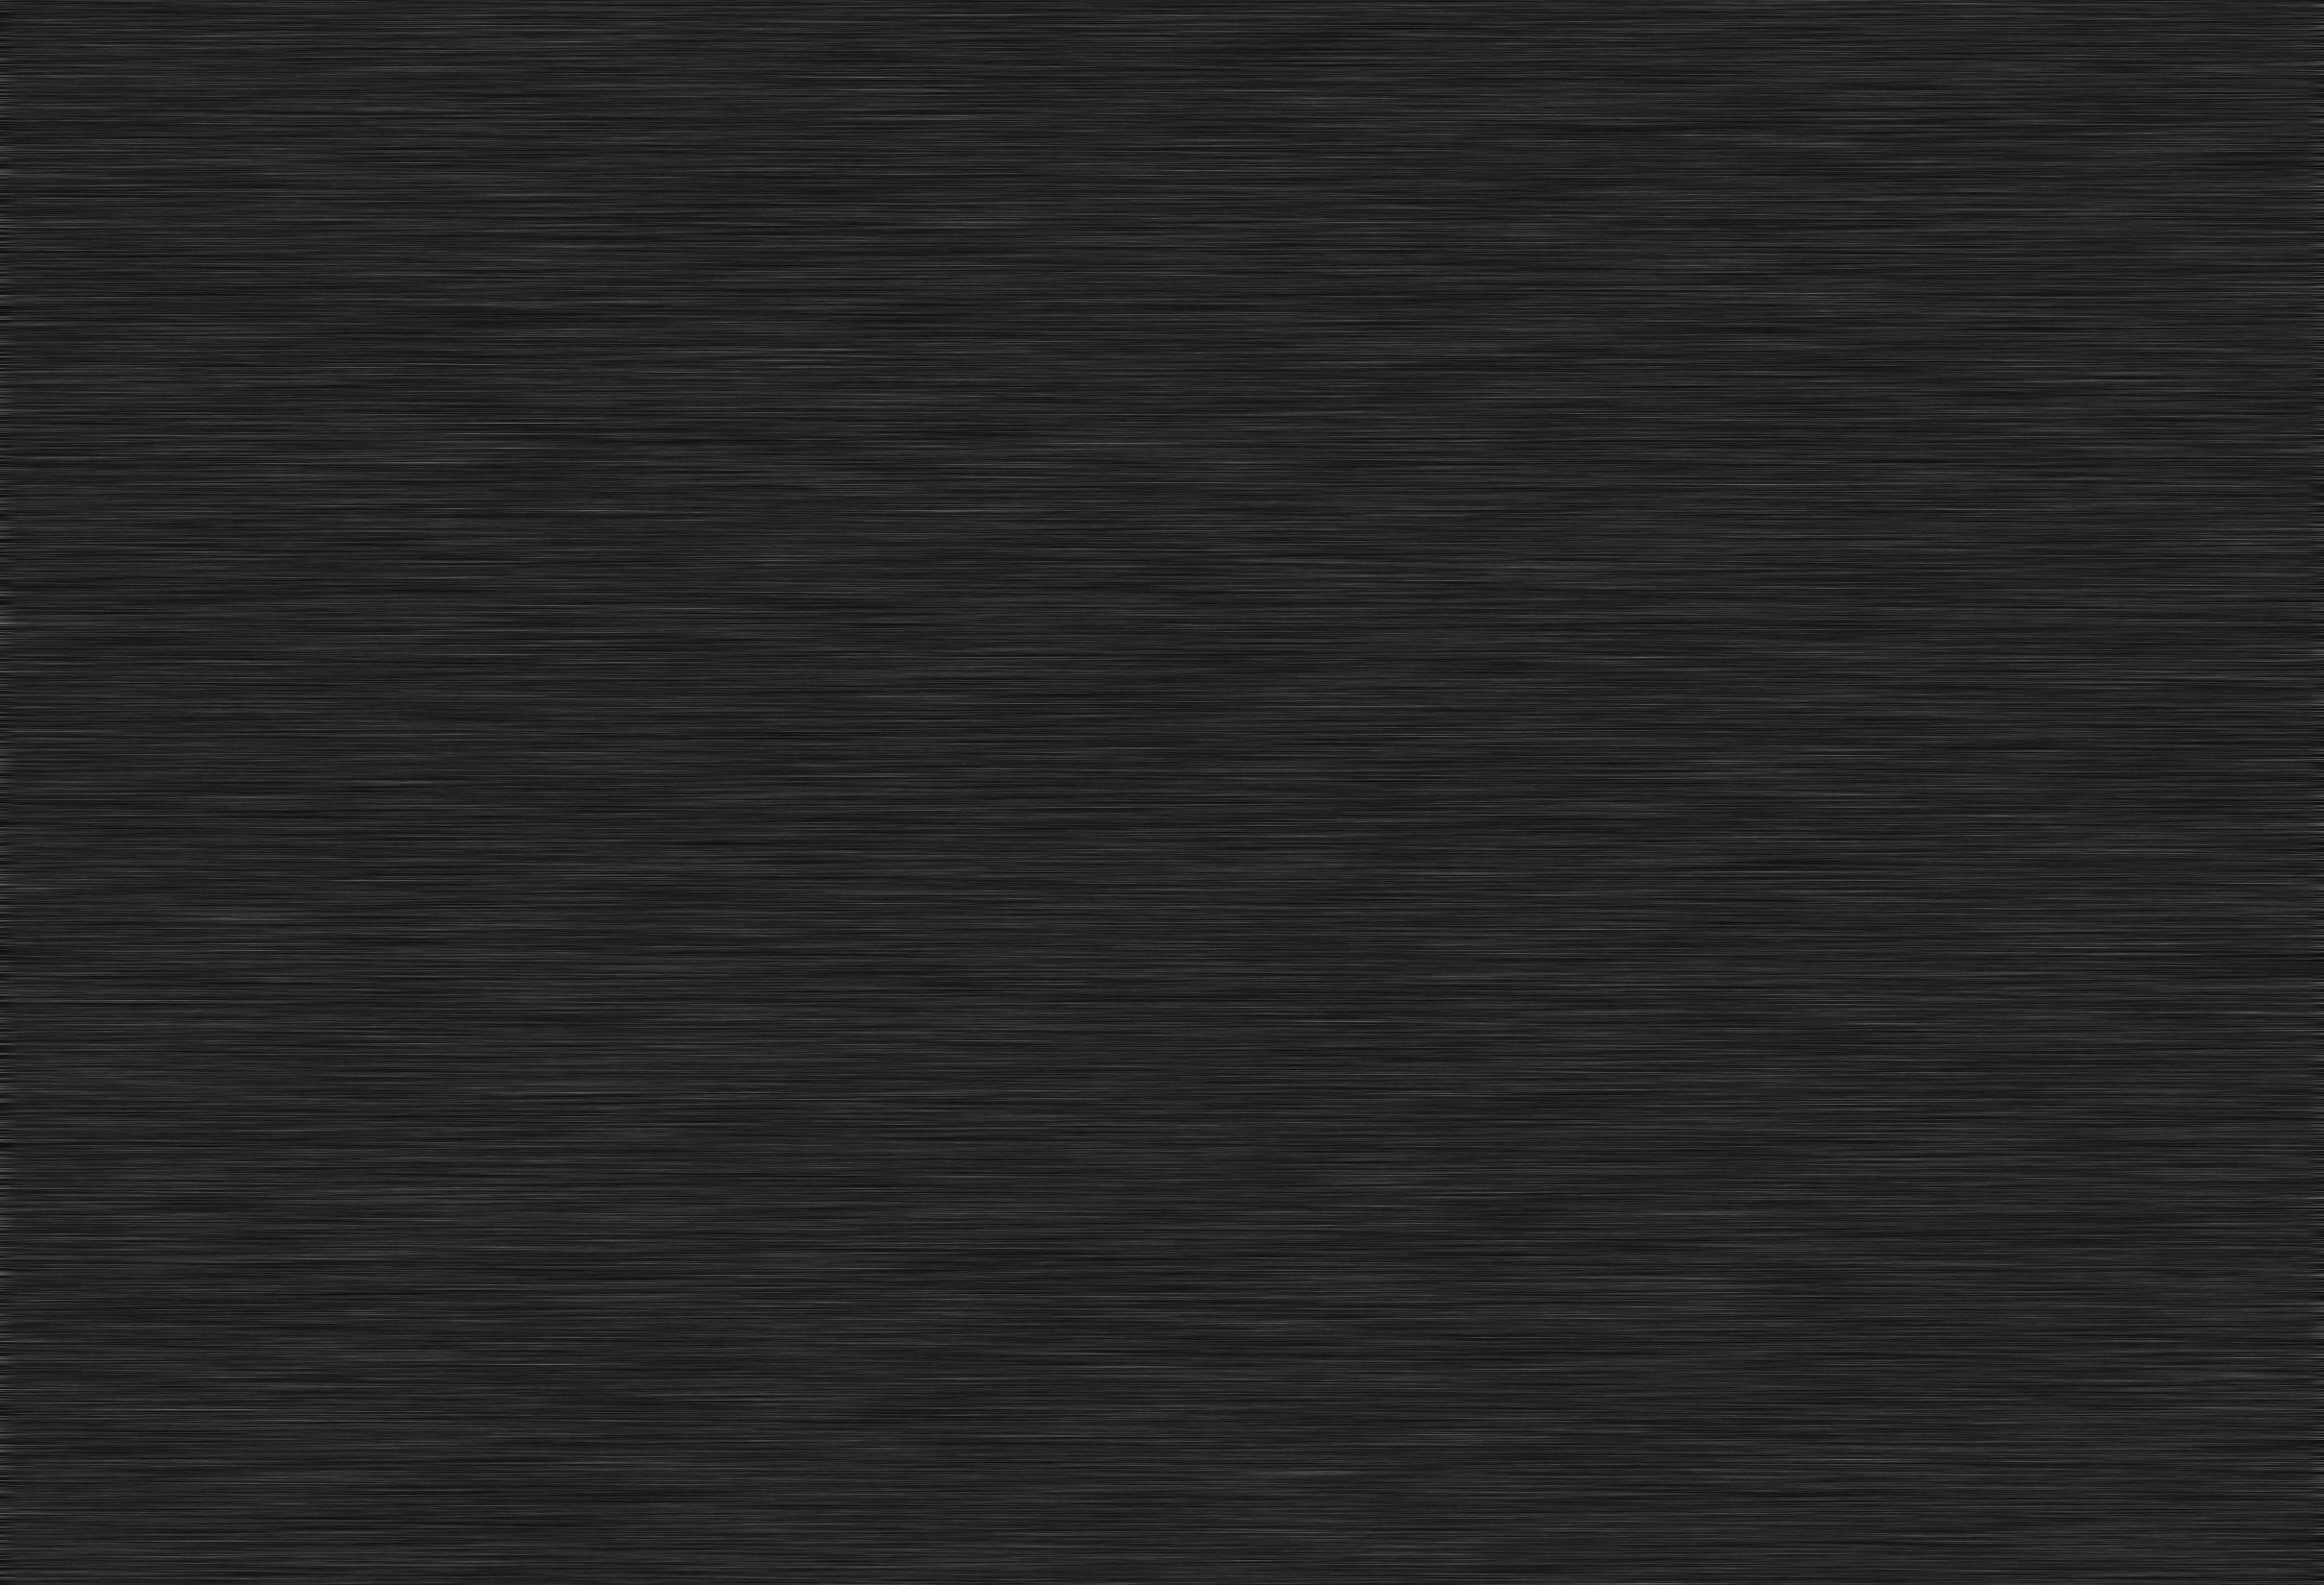 Black Metal Texture. Exellent Black Metal Texture Throughout Ideas